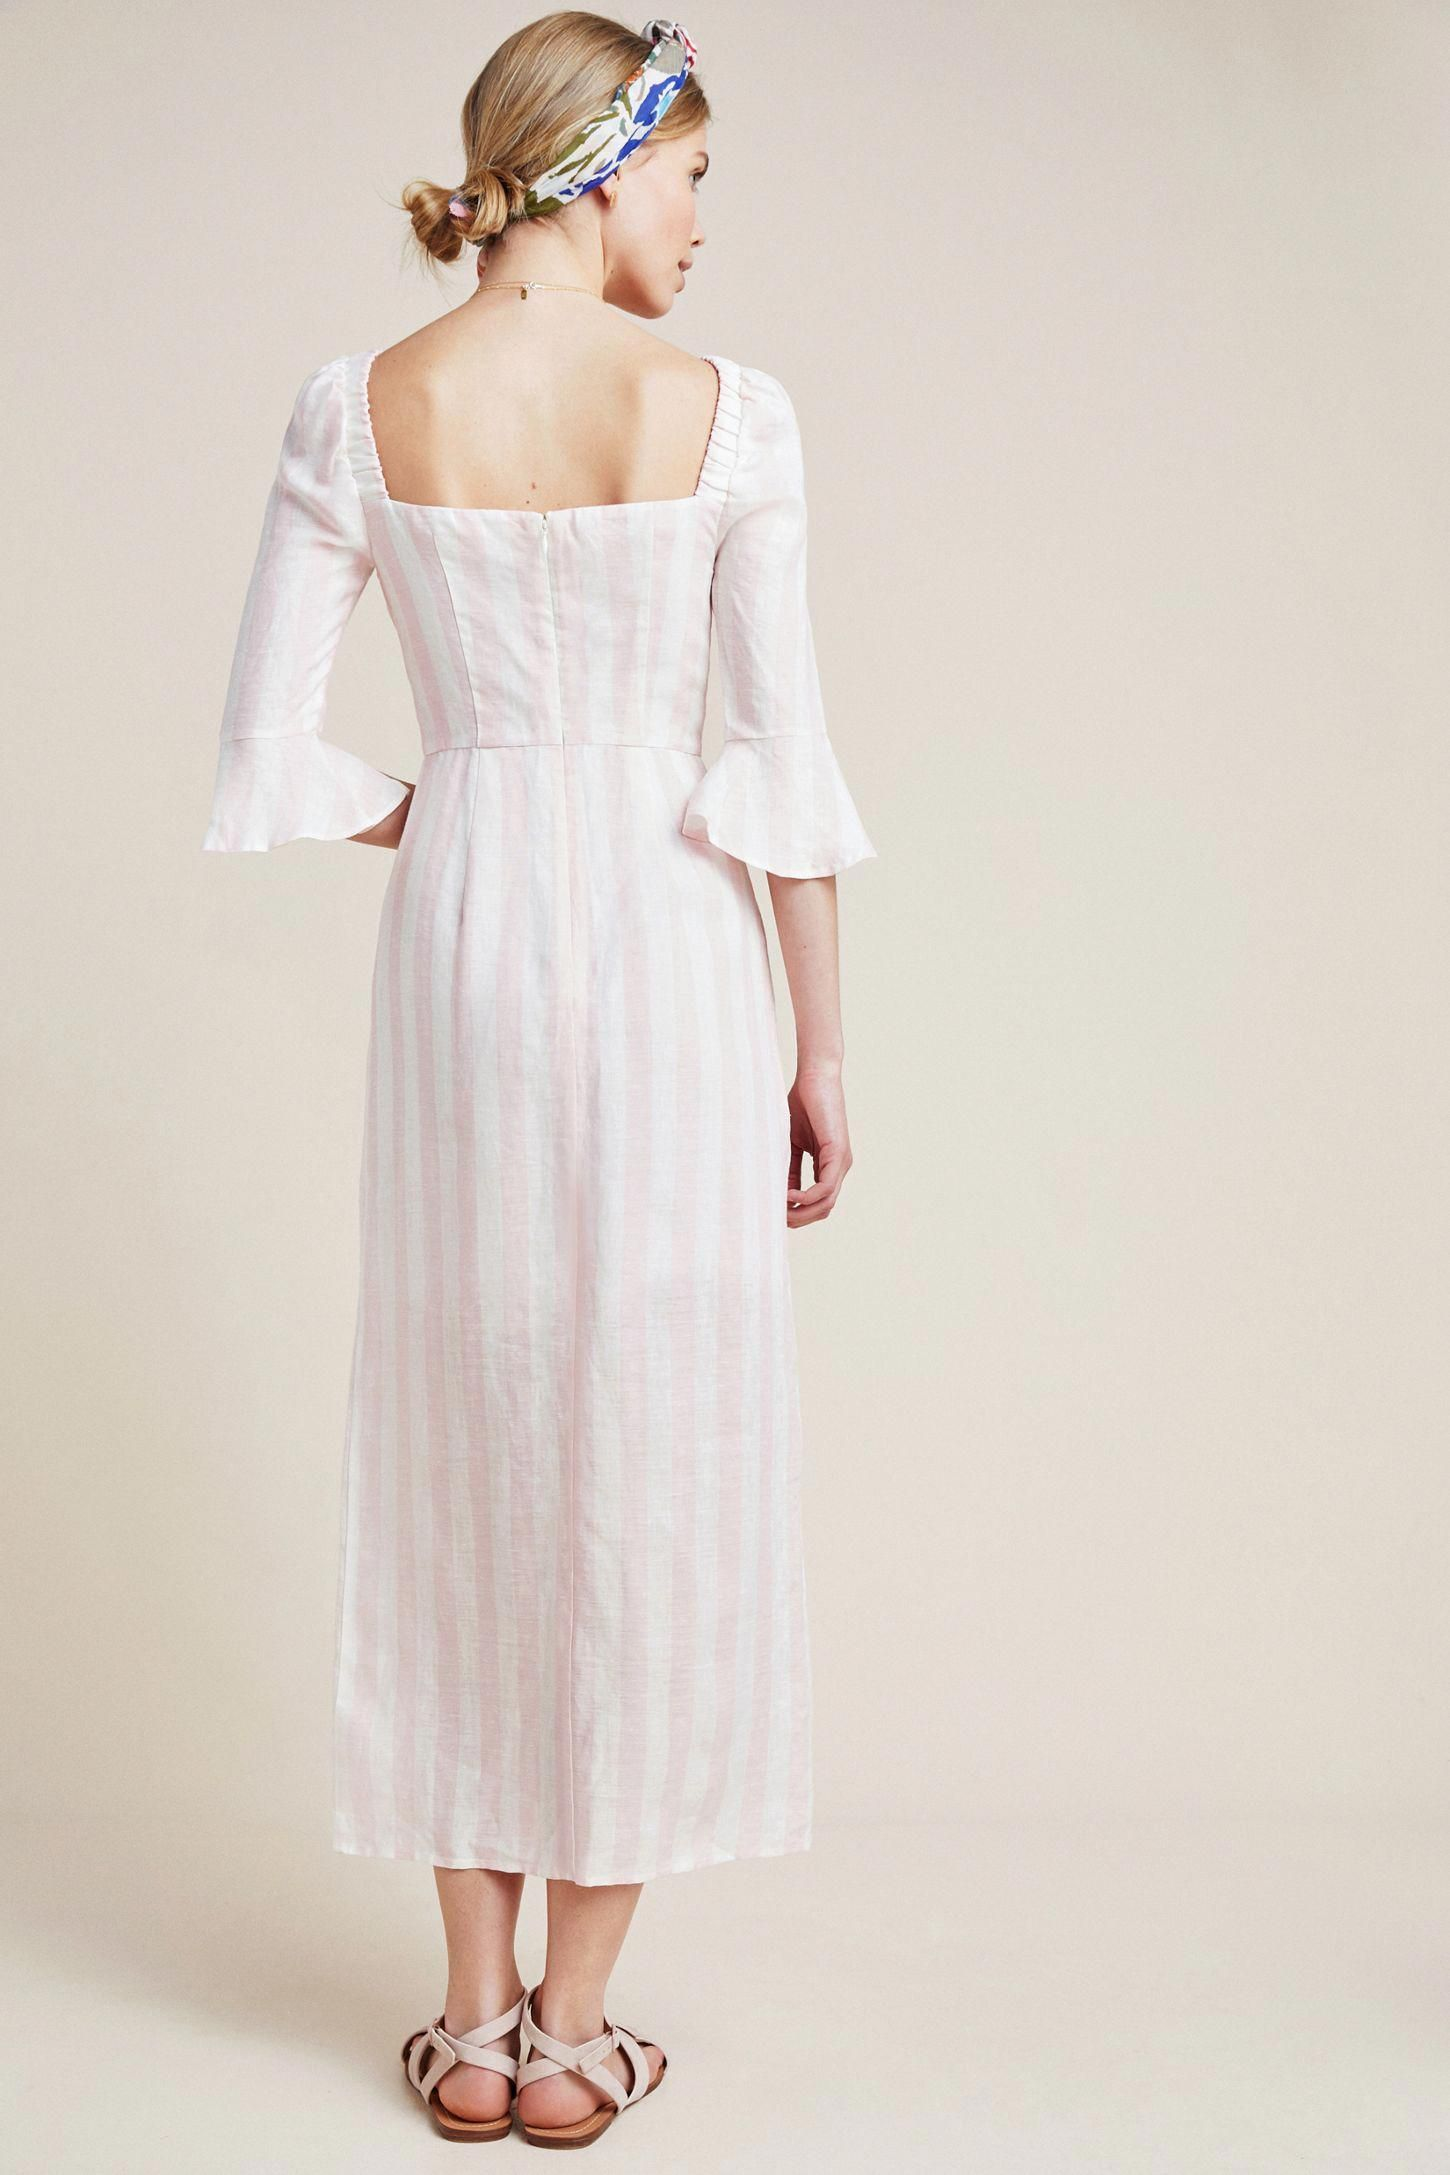 Slide View 3 Structured Linen Midi Dress Linenweddingdresses Midi Wedding Dress Ball Gown Wedding Dress Dresses [ 2175 x 1450 Pixel ]